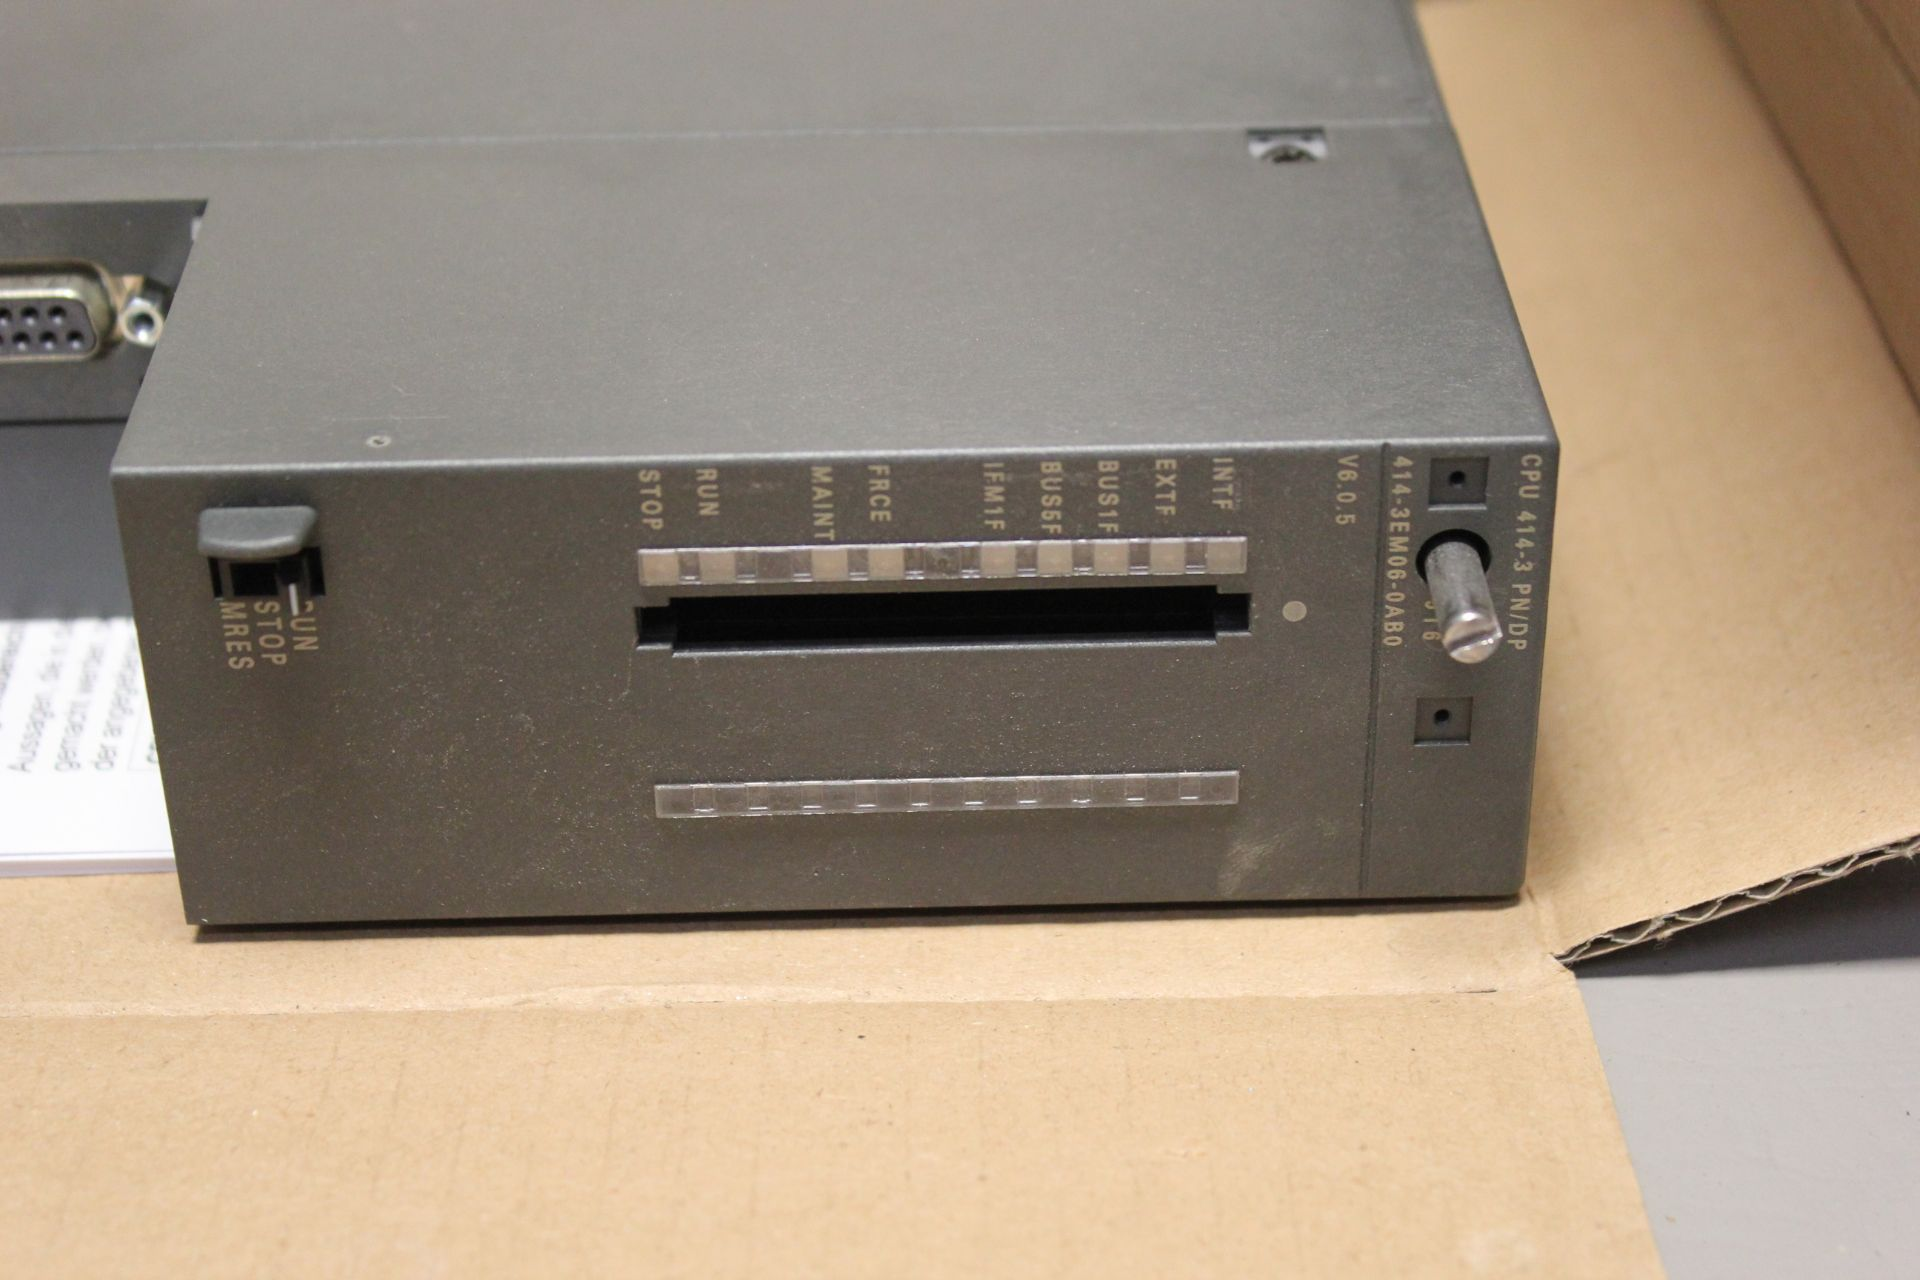 NEW SIEMENS SIMATIC S7-400 PLC CPU PROCESSOR - Image 5 of 8